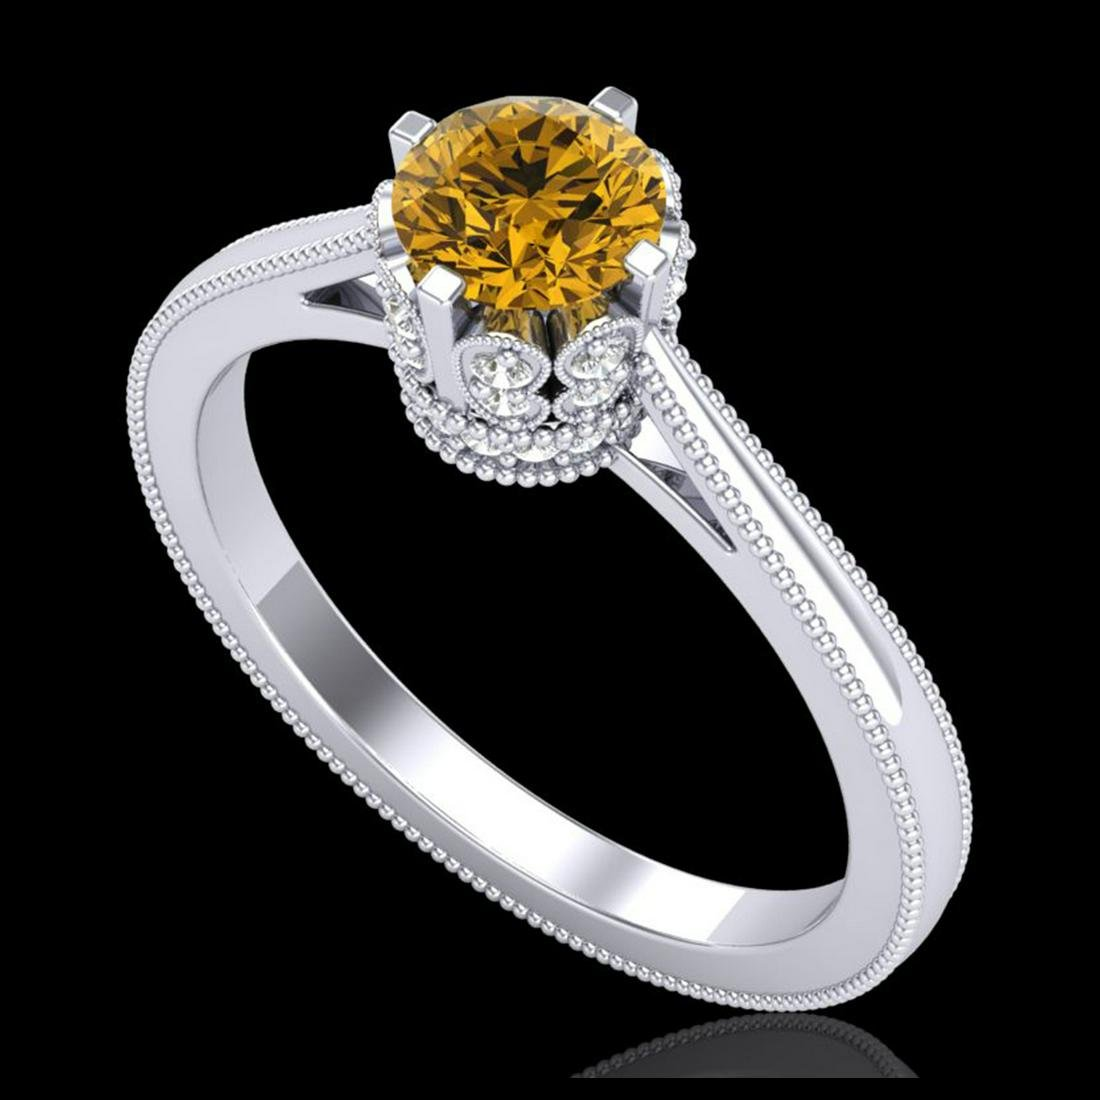 0.81 ctw Intense Fancy Yellow Diamond Art Deco Ring 18K